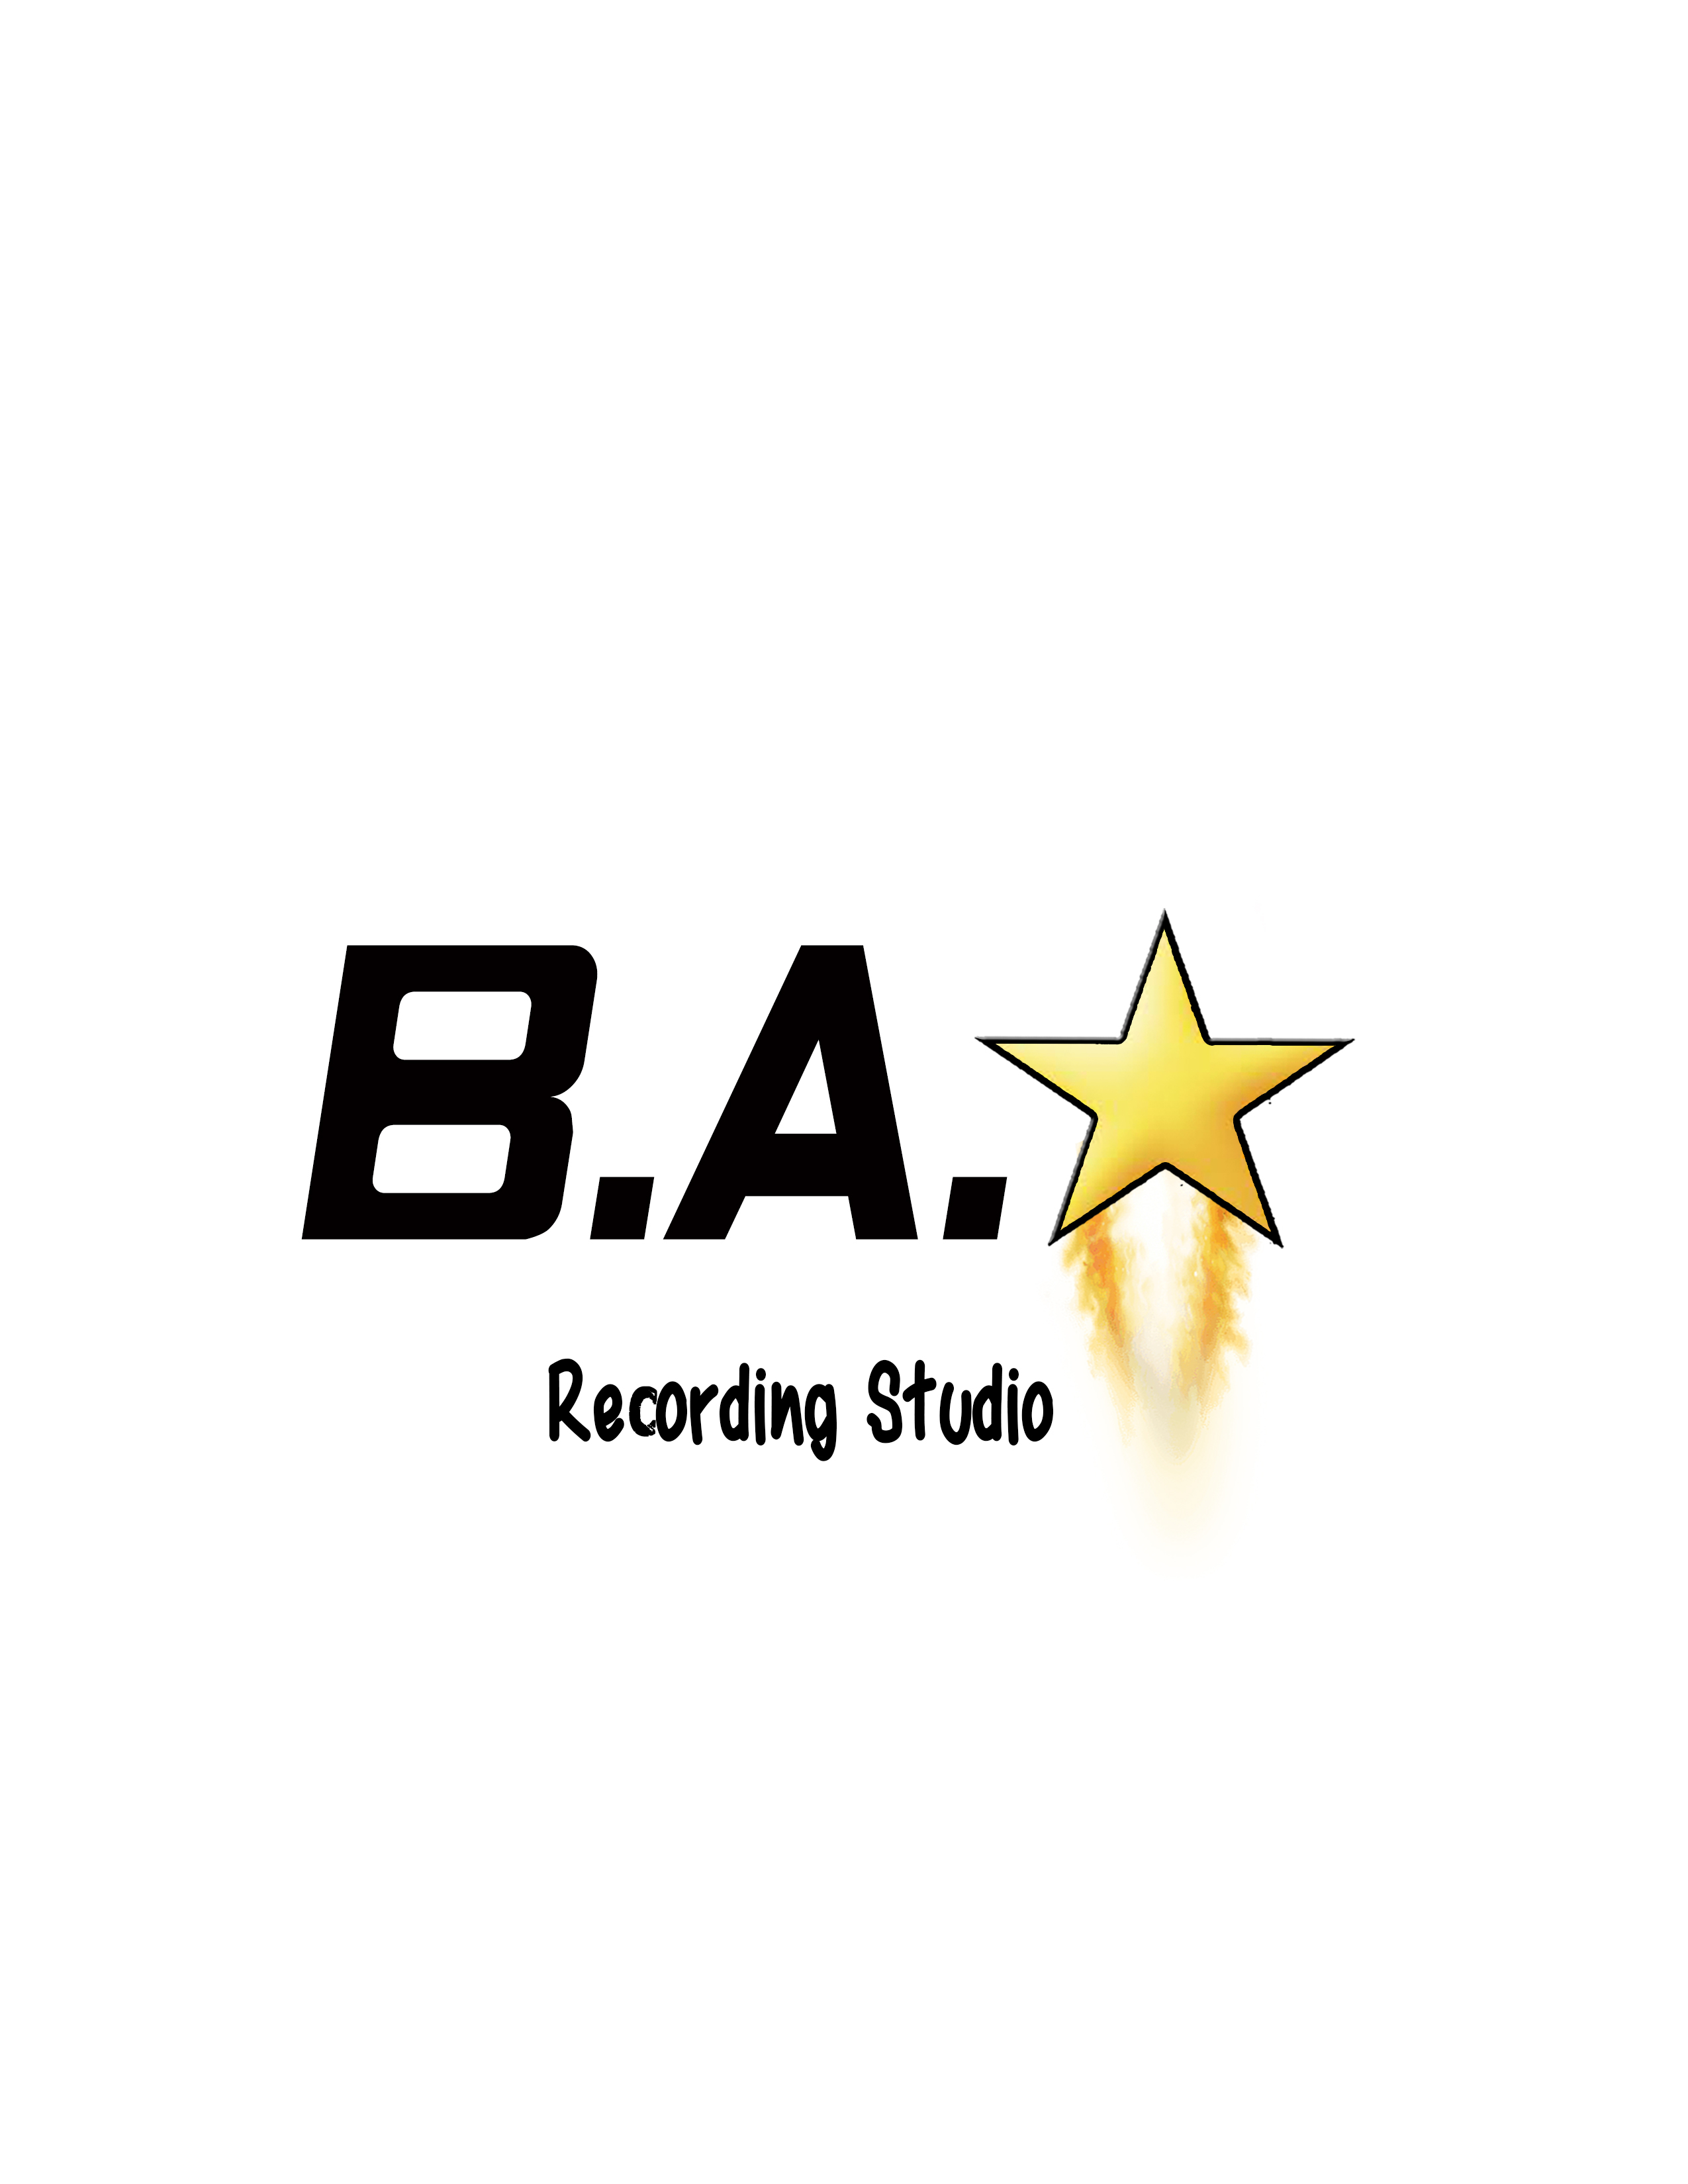 Become A Star Studio